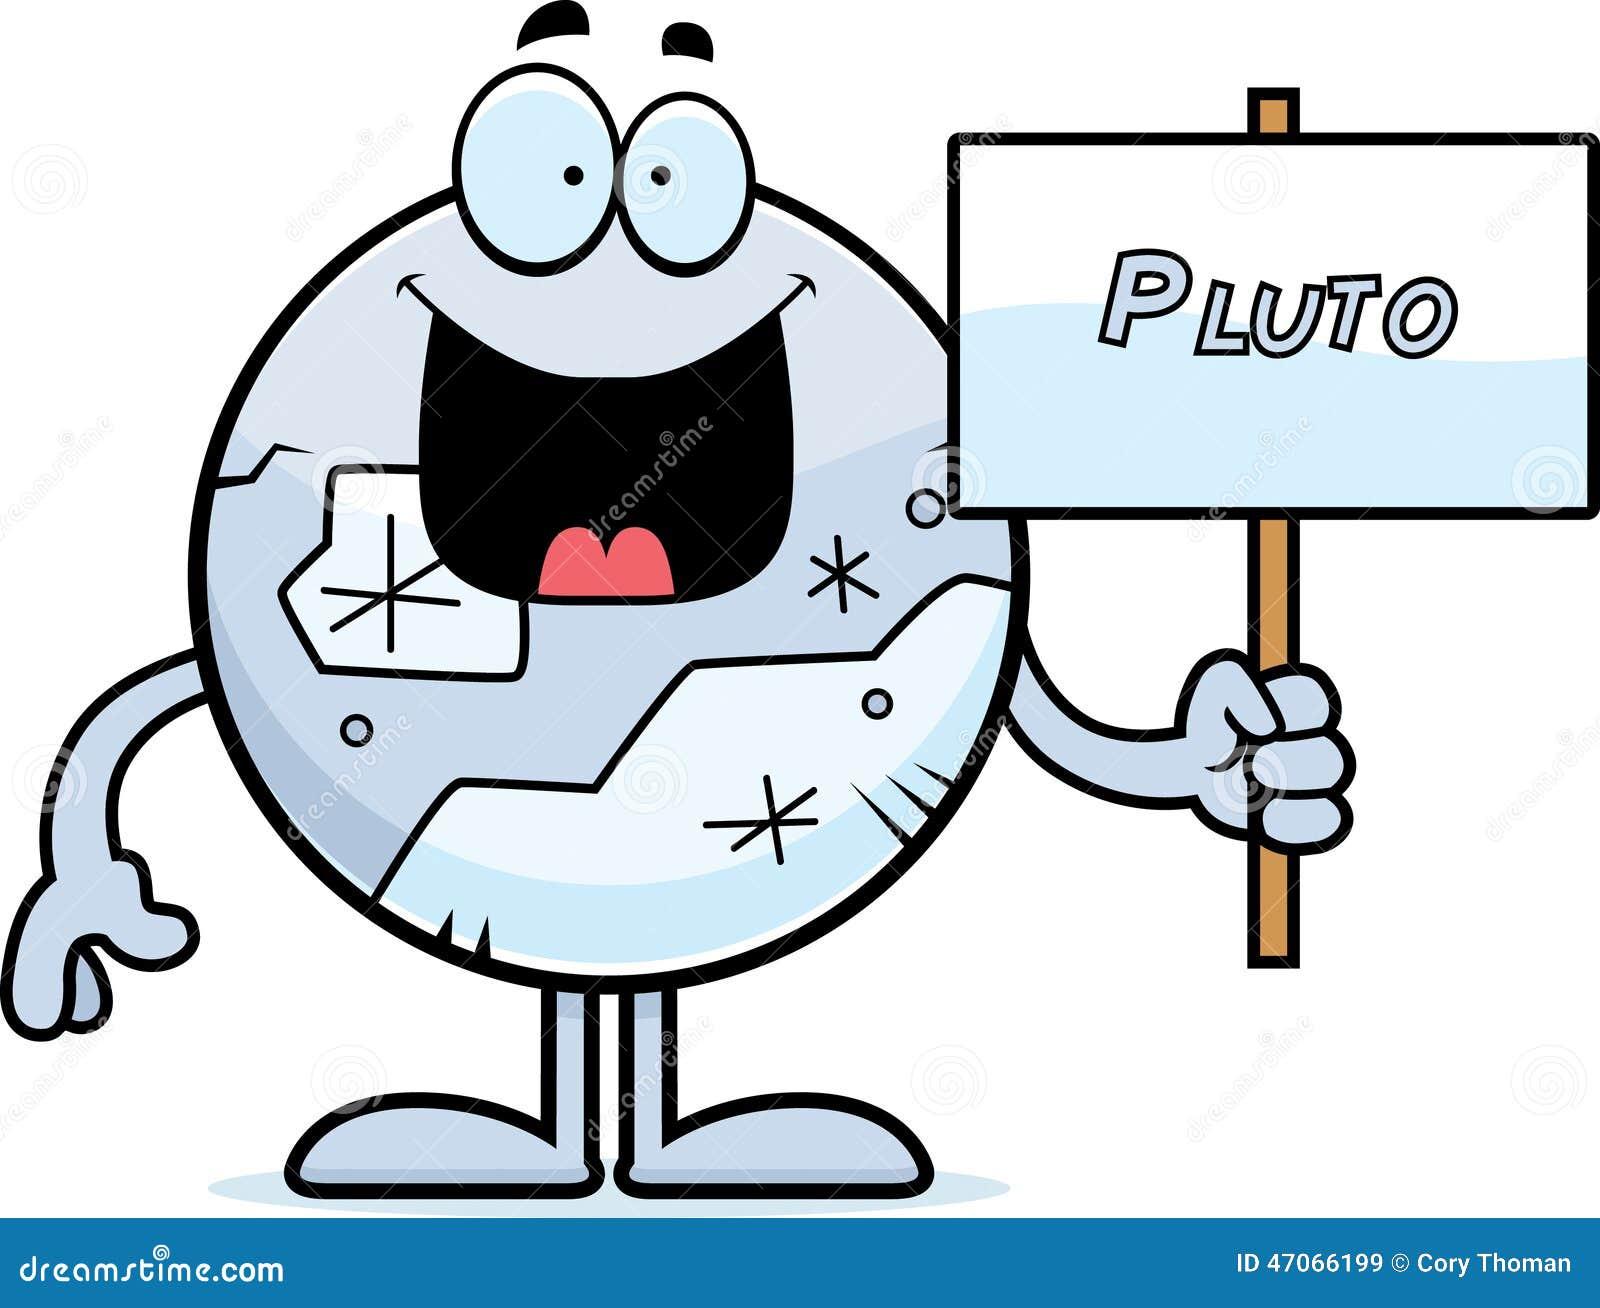 Cartoon Pluto Sign Stock Vector - Image: 47066199